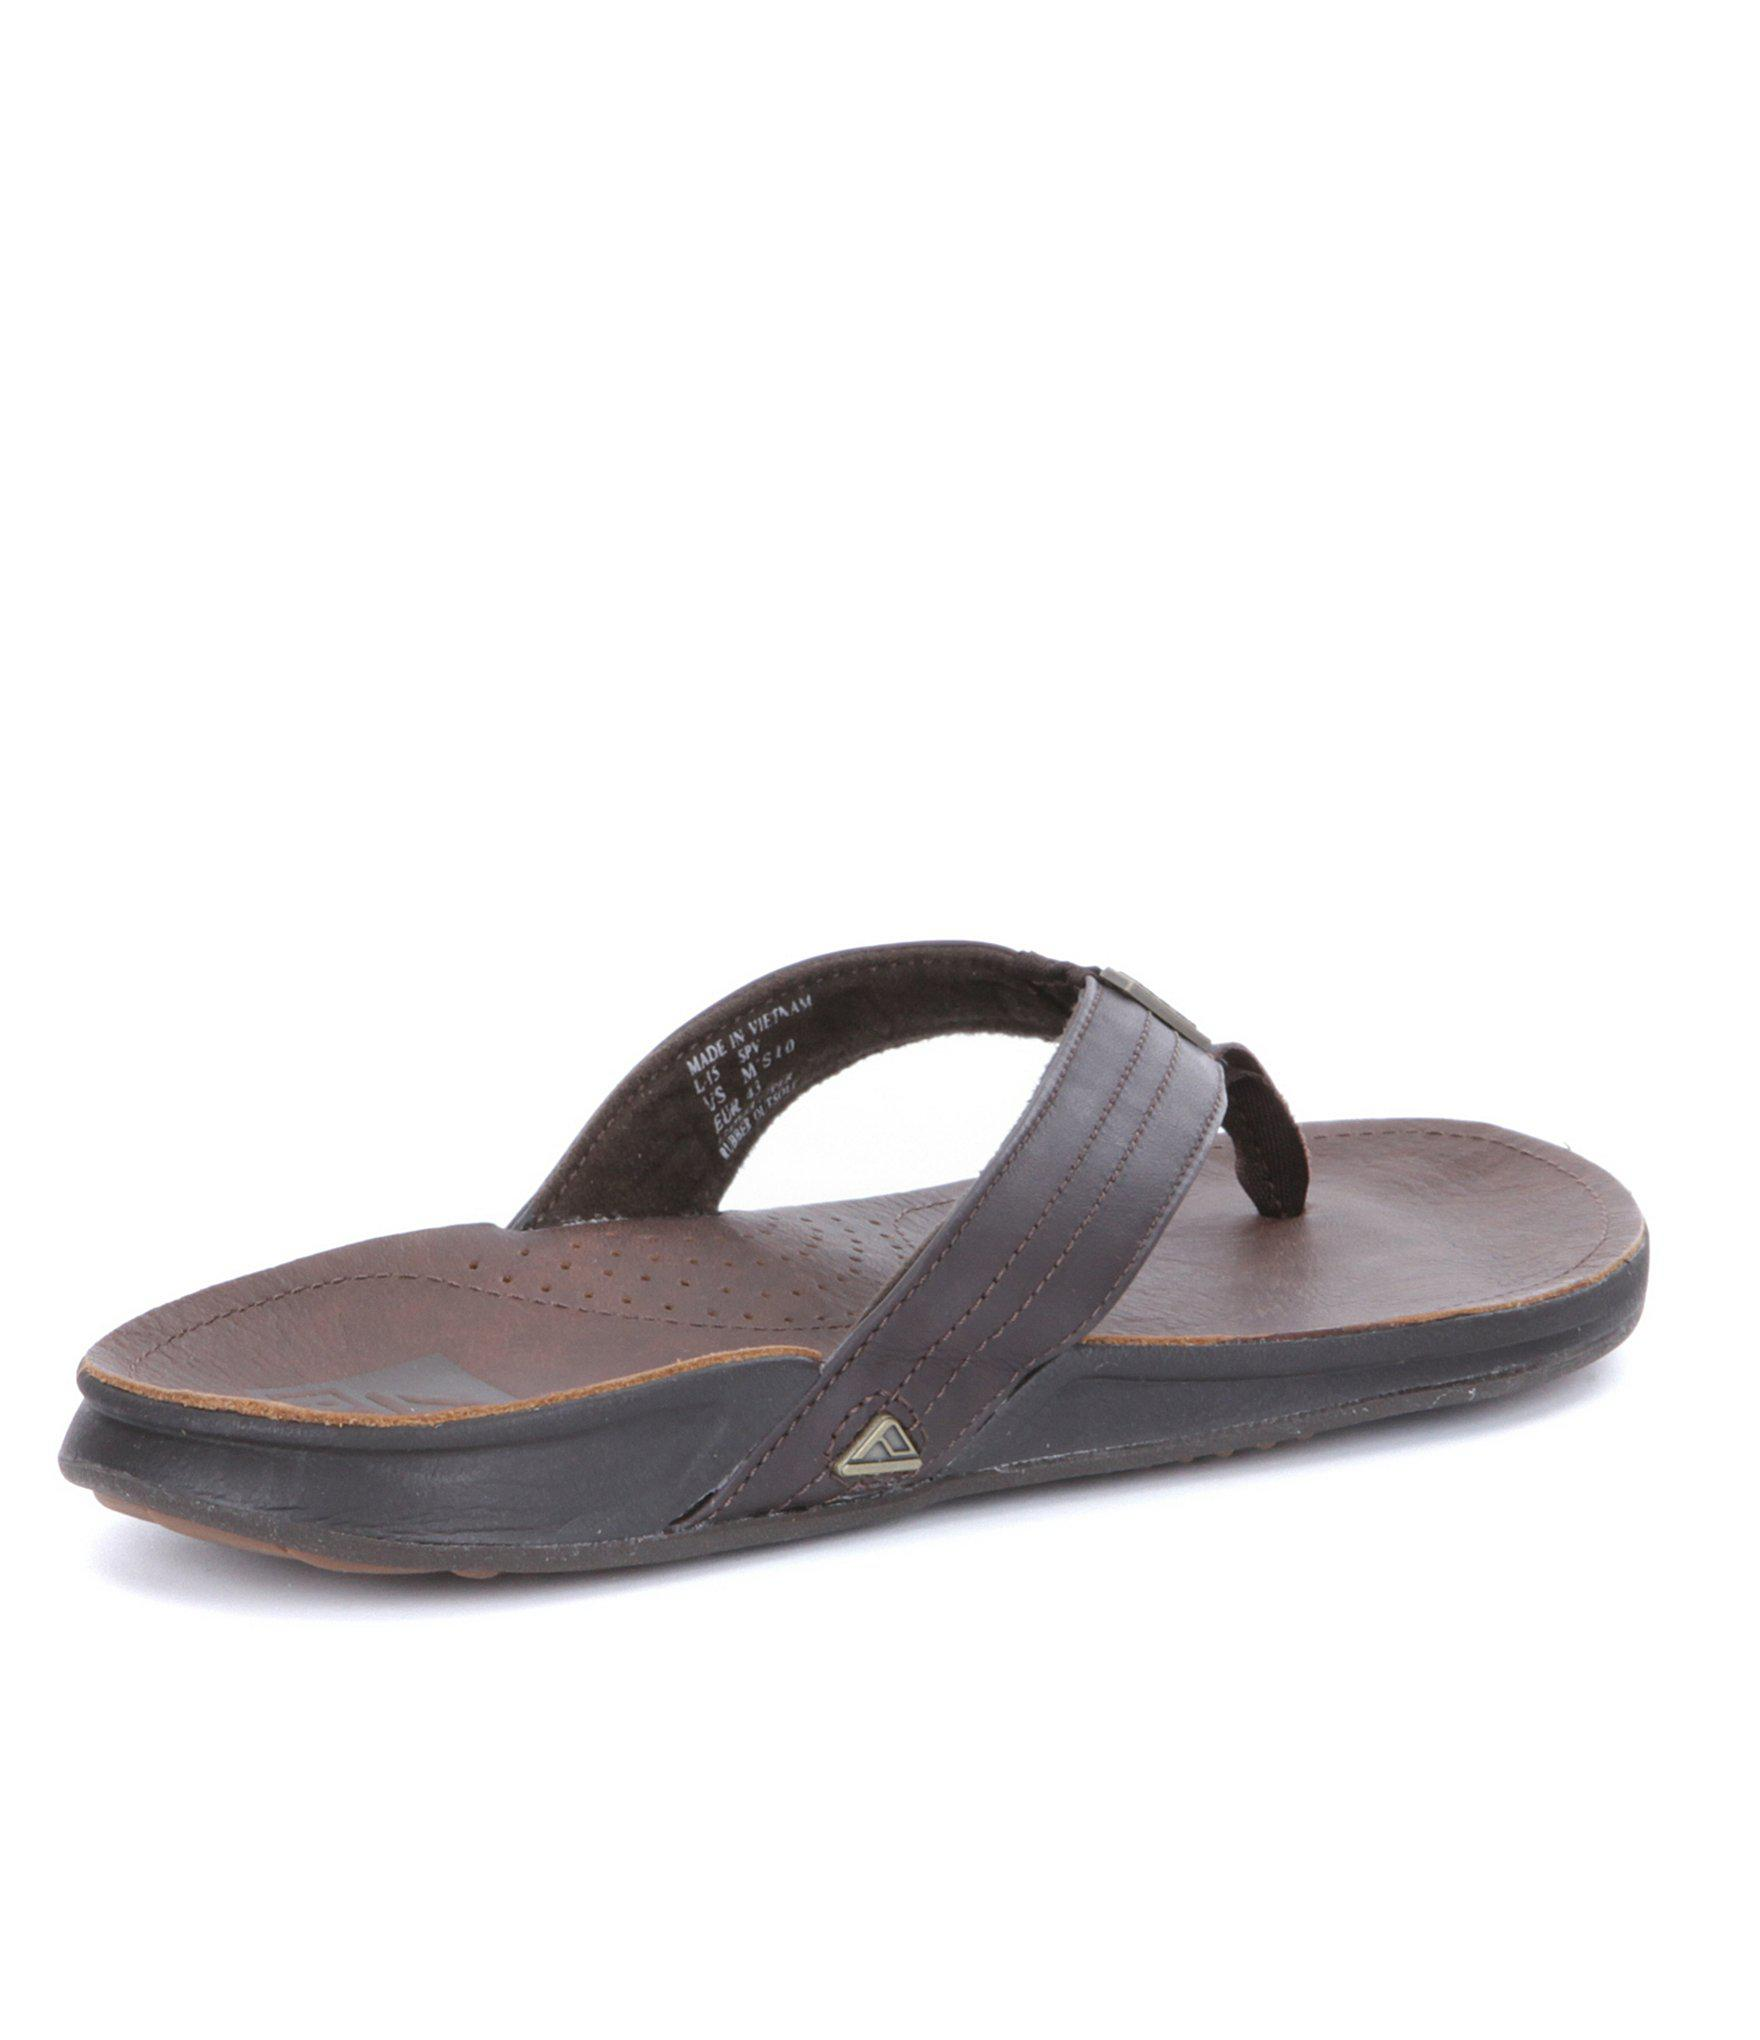 725bbf78b Reef - Brown Men ́s J-bay Iii Sandals for Men - Lyst. View fullscreen